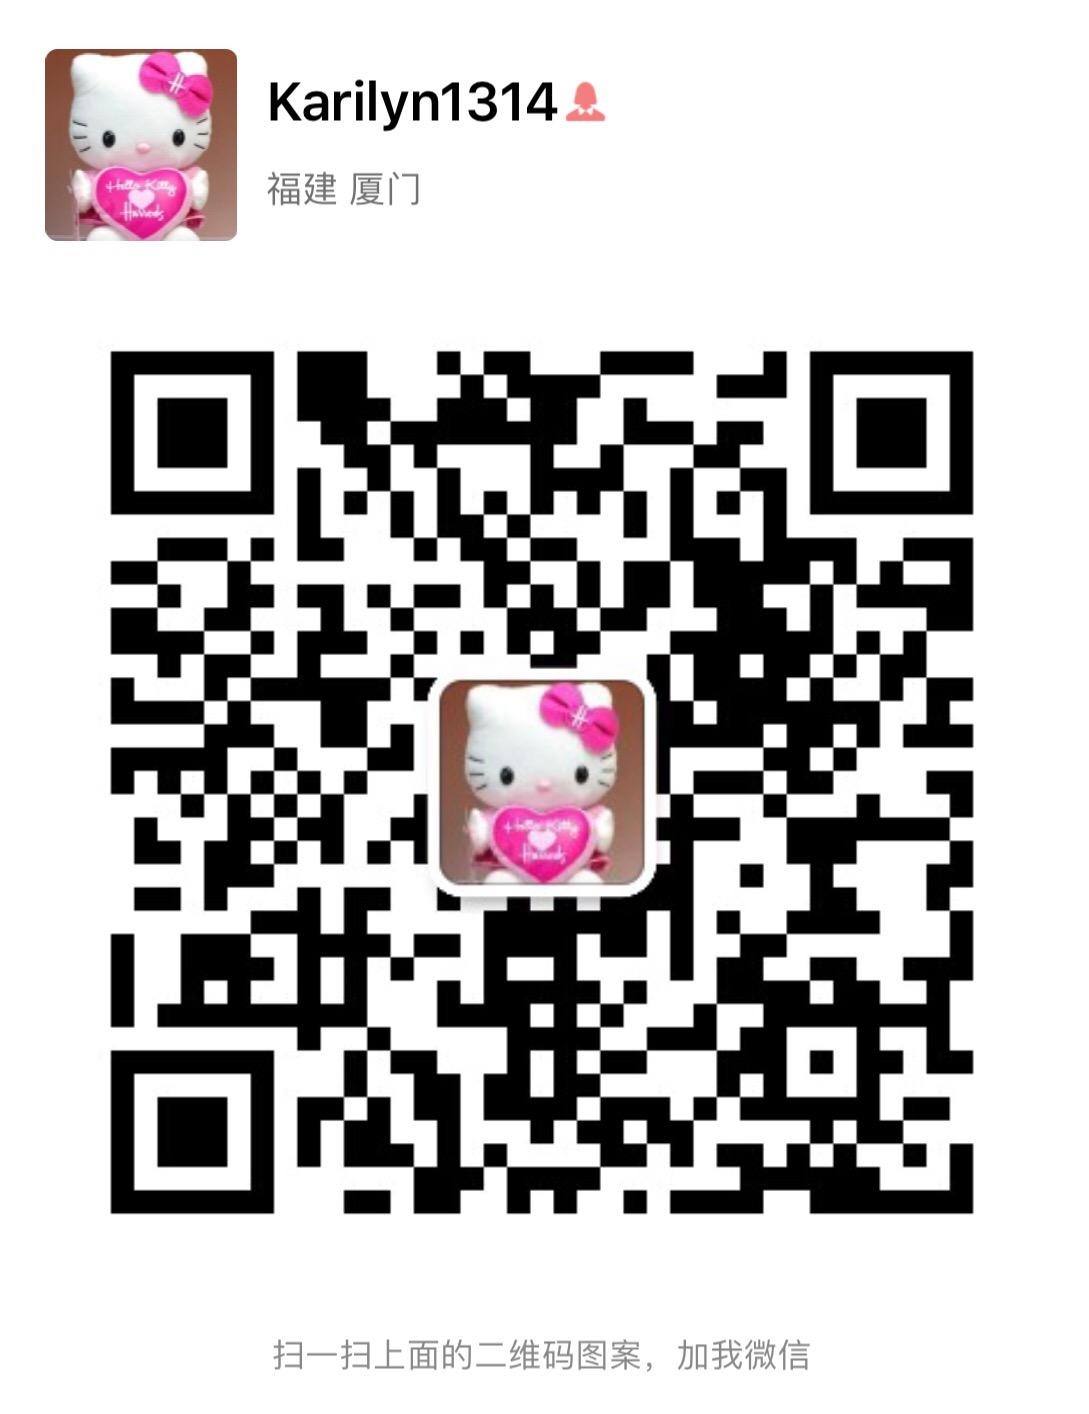 876690F7-A2E9-4B2B-ADCC-0F29A1174FE6.jpeg